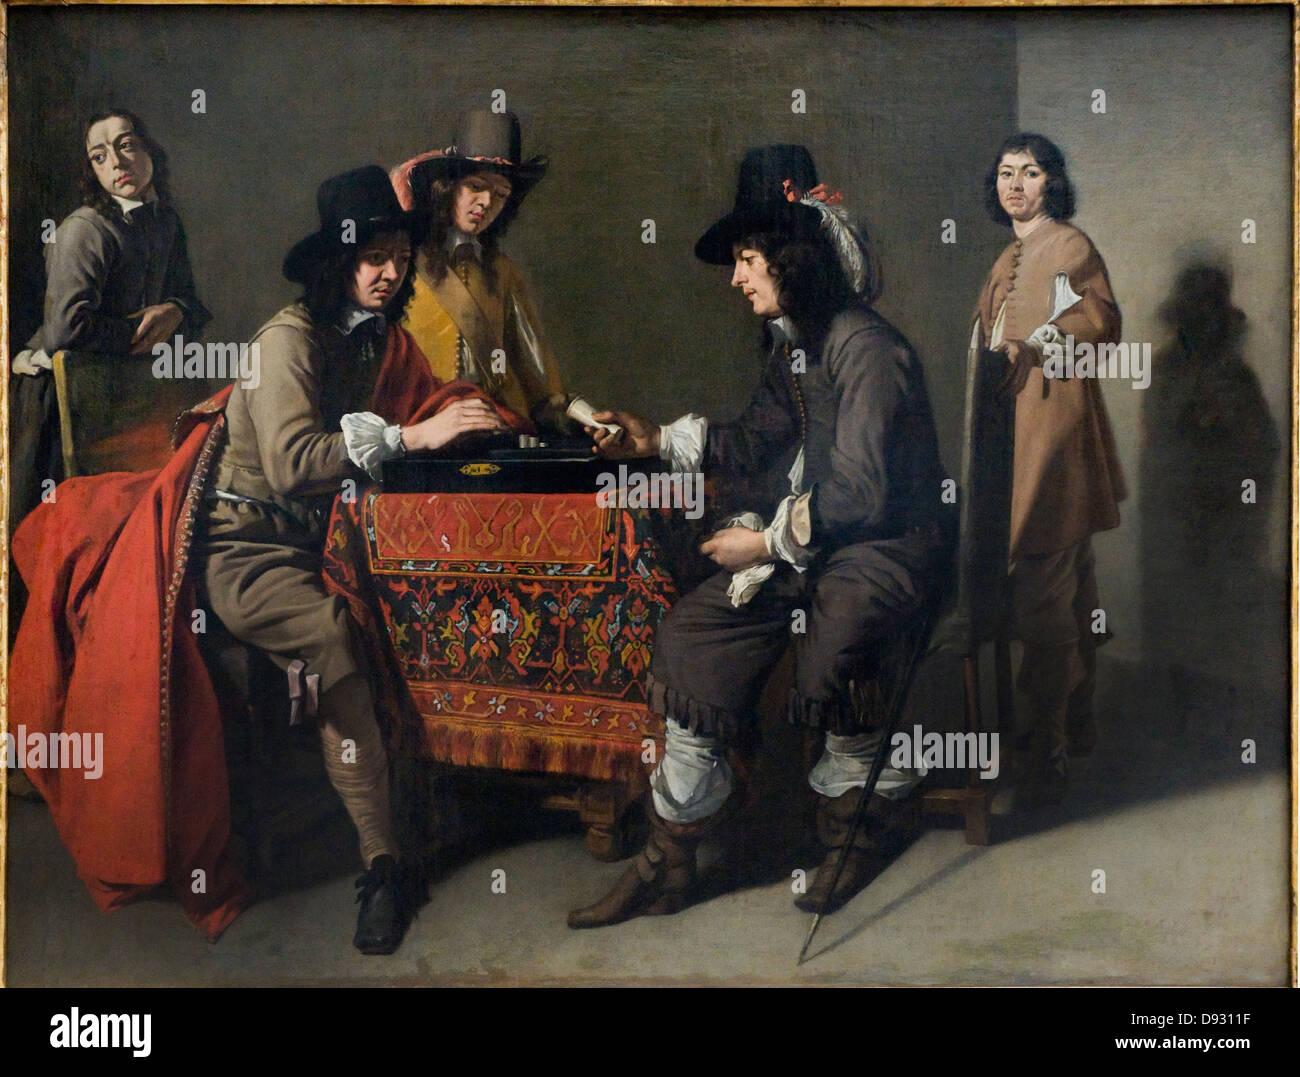 Maître des Jeux Middle of the XVII century Les joueurs de tric-trac - tric trac players French school - Stock Image